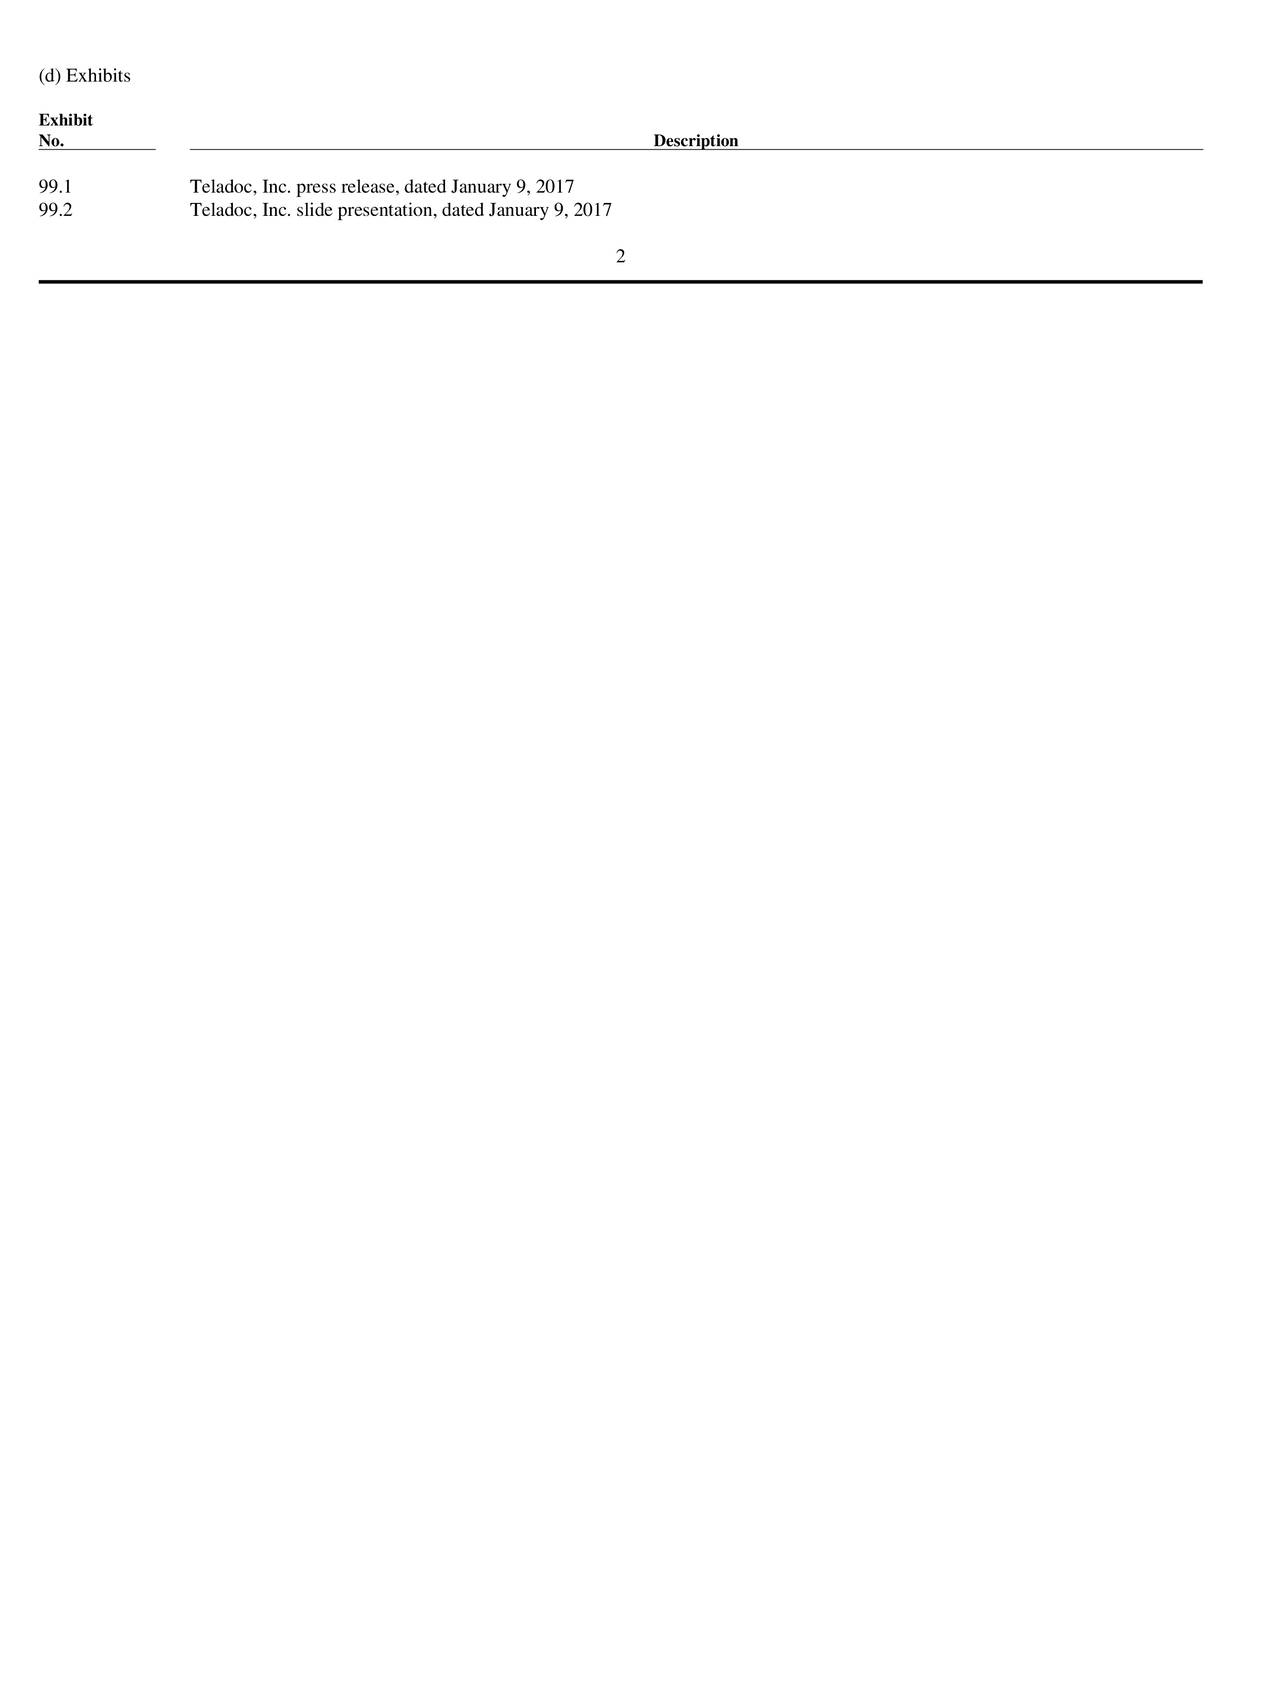 Exhibit No. Description 99.1 Teladoc, Inc. press release, dated January 9, 2017 99.2 Teladoc, Inc. slide presentation, dated January 9, 2017 2